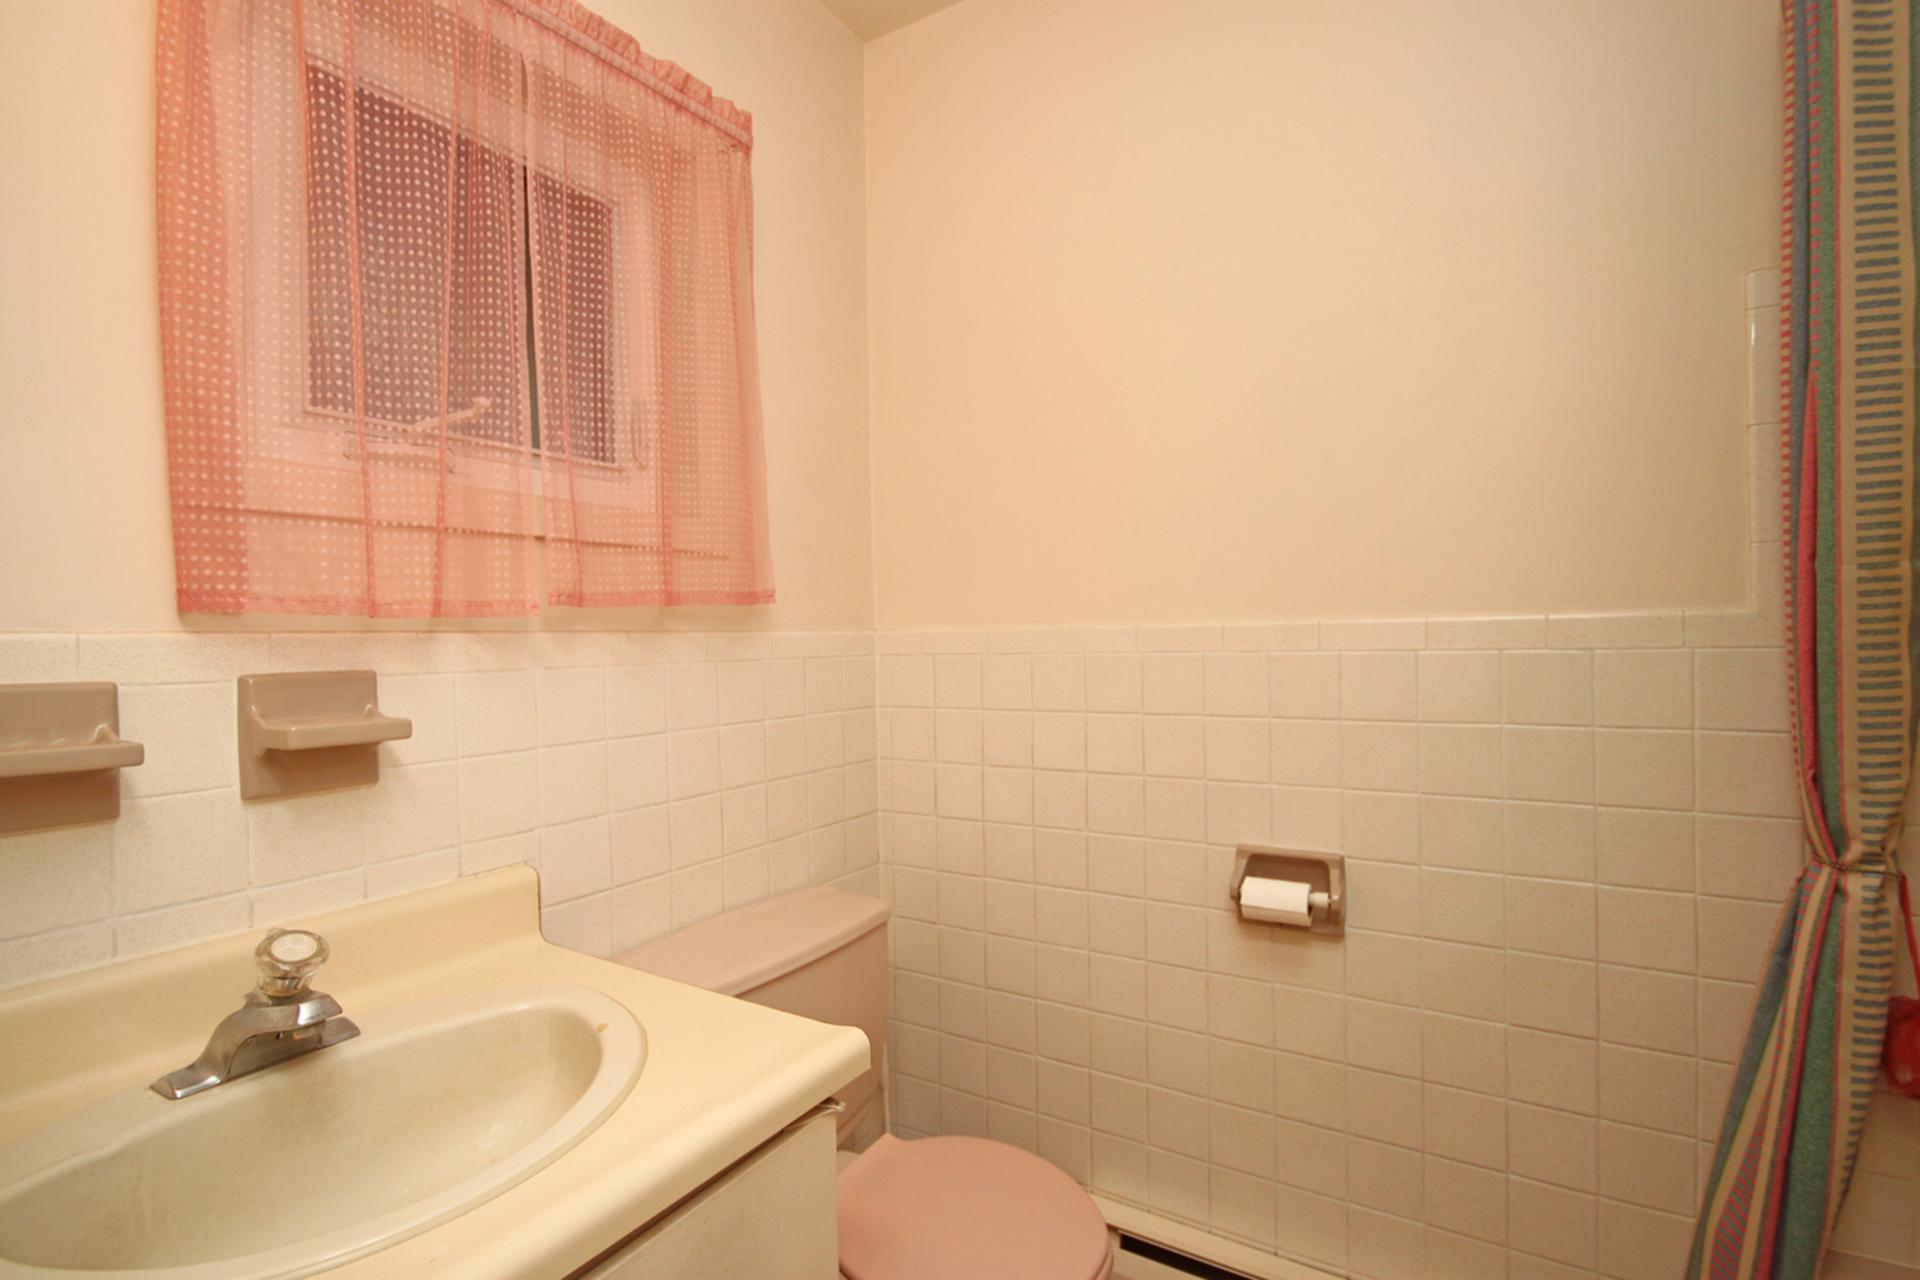 4 Piece Bathroom at 63 Hesketh Court, Victoria Village, Toronto